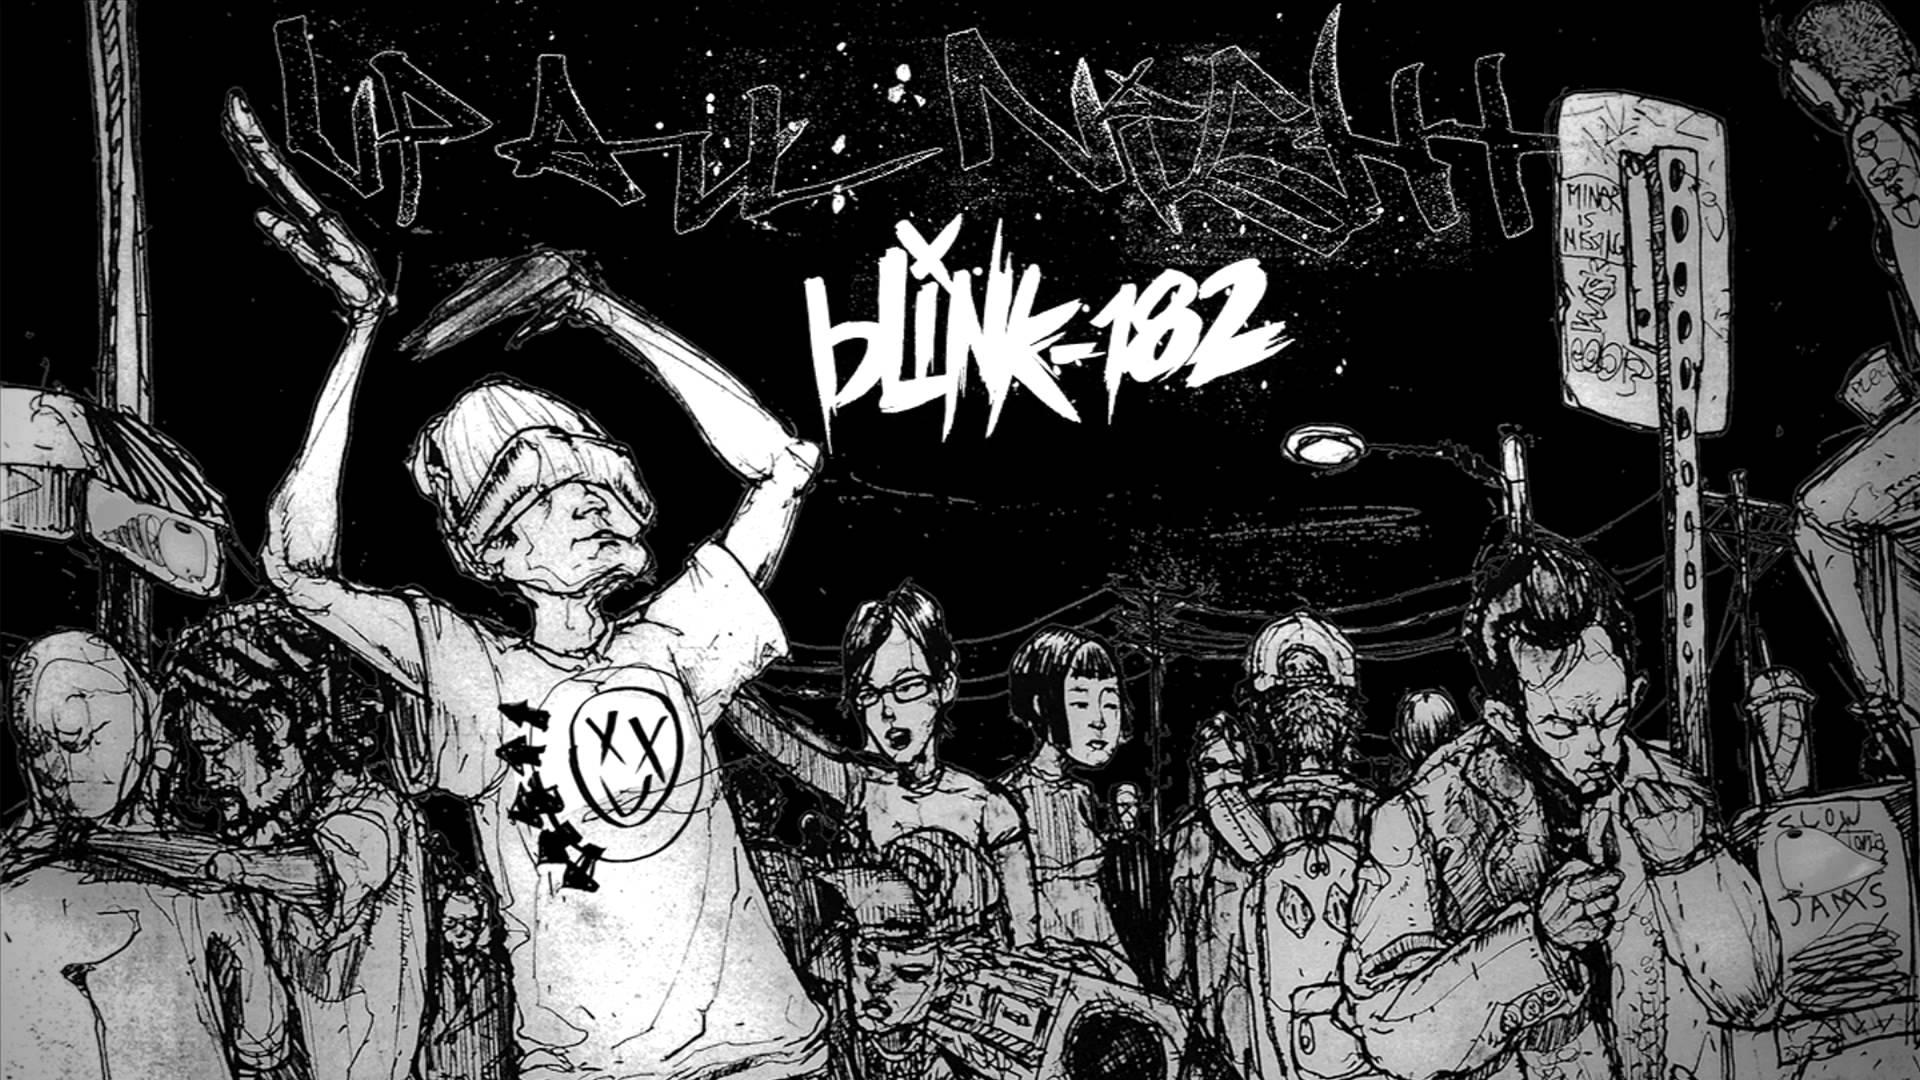 Travis Barker Wallpapers Group - Blink 182 Up All Night - HD Wallpaper